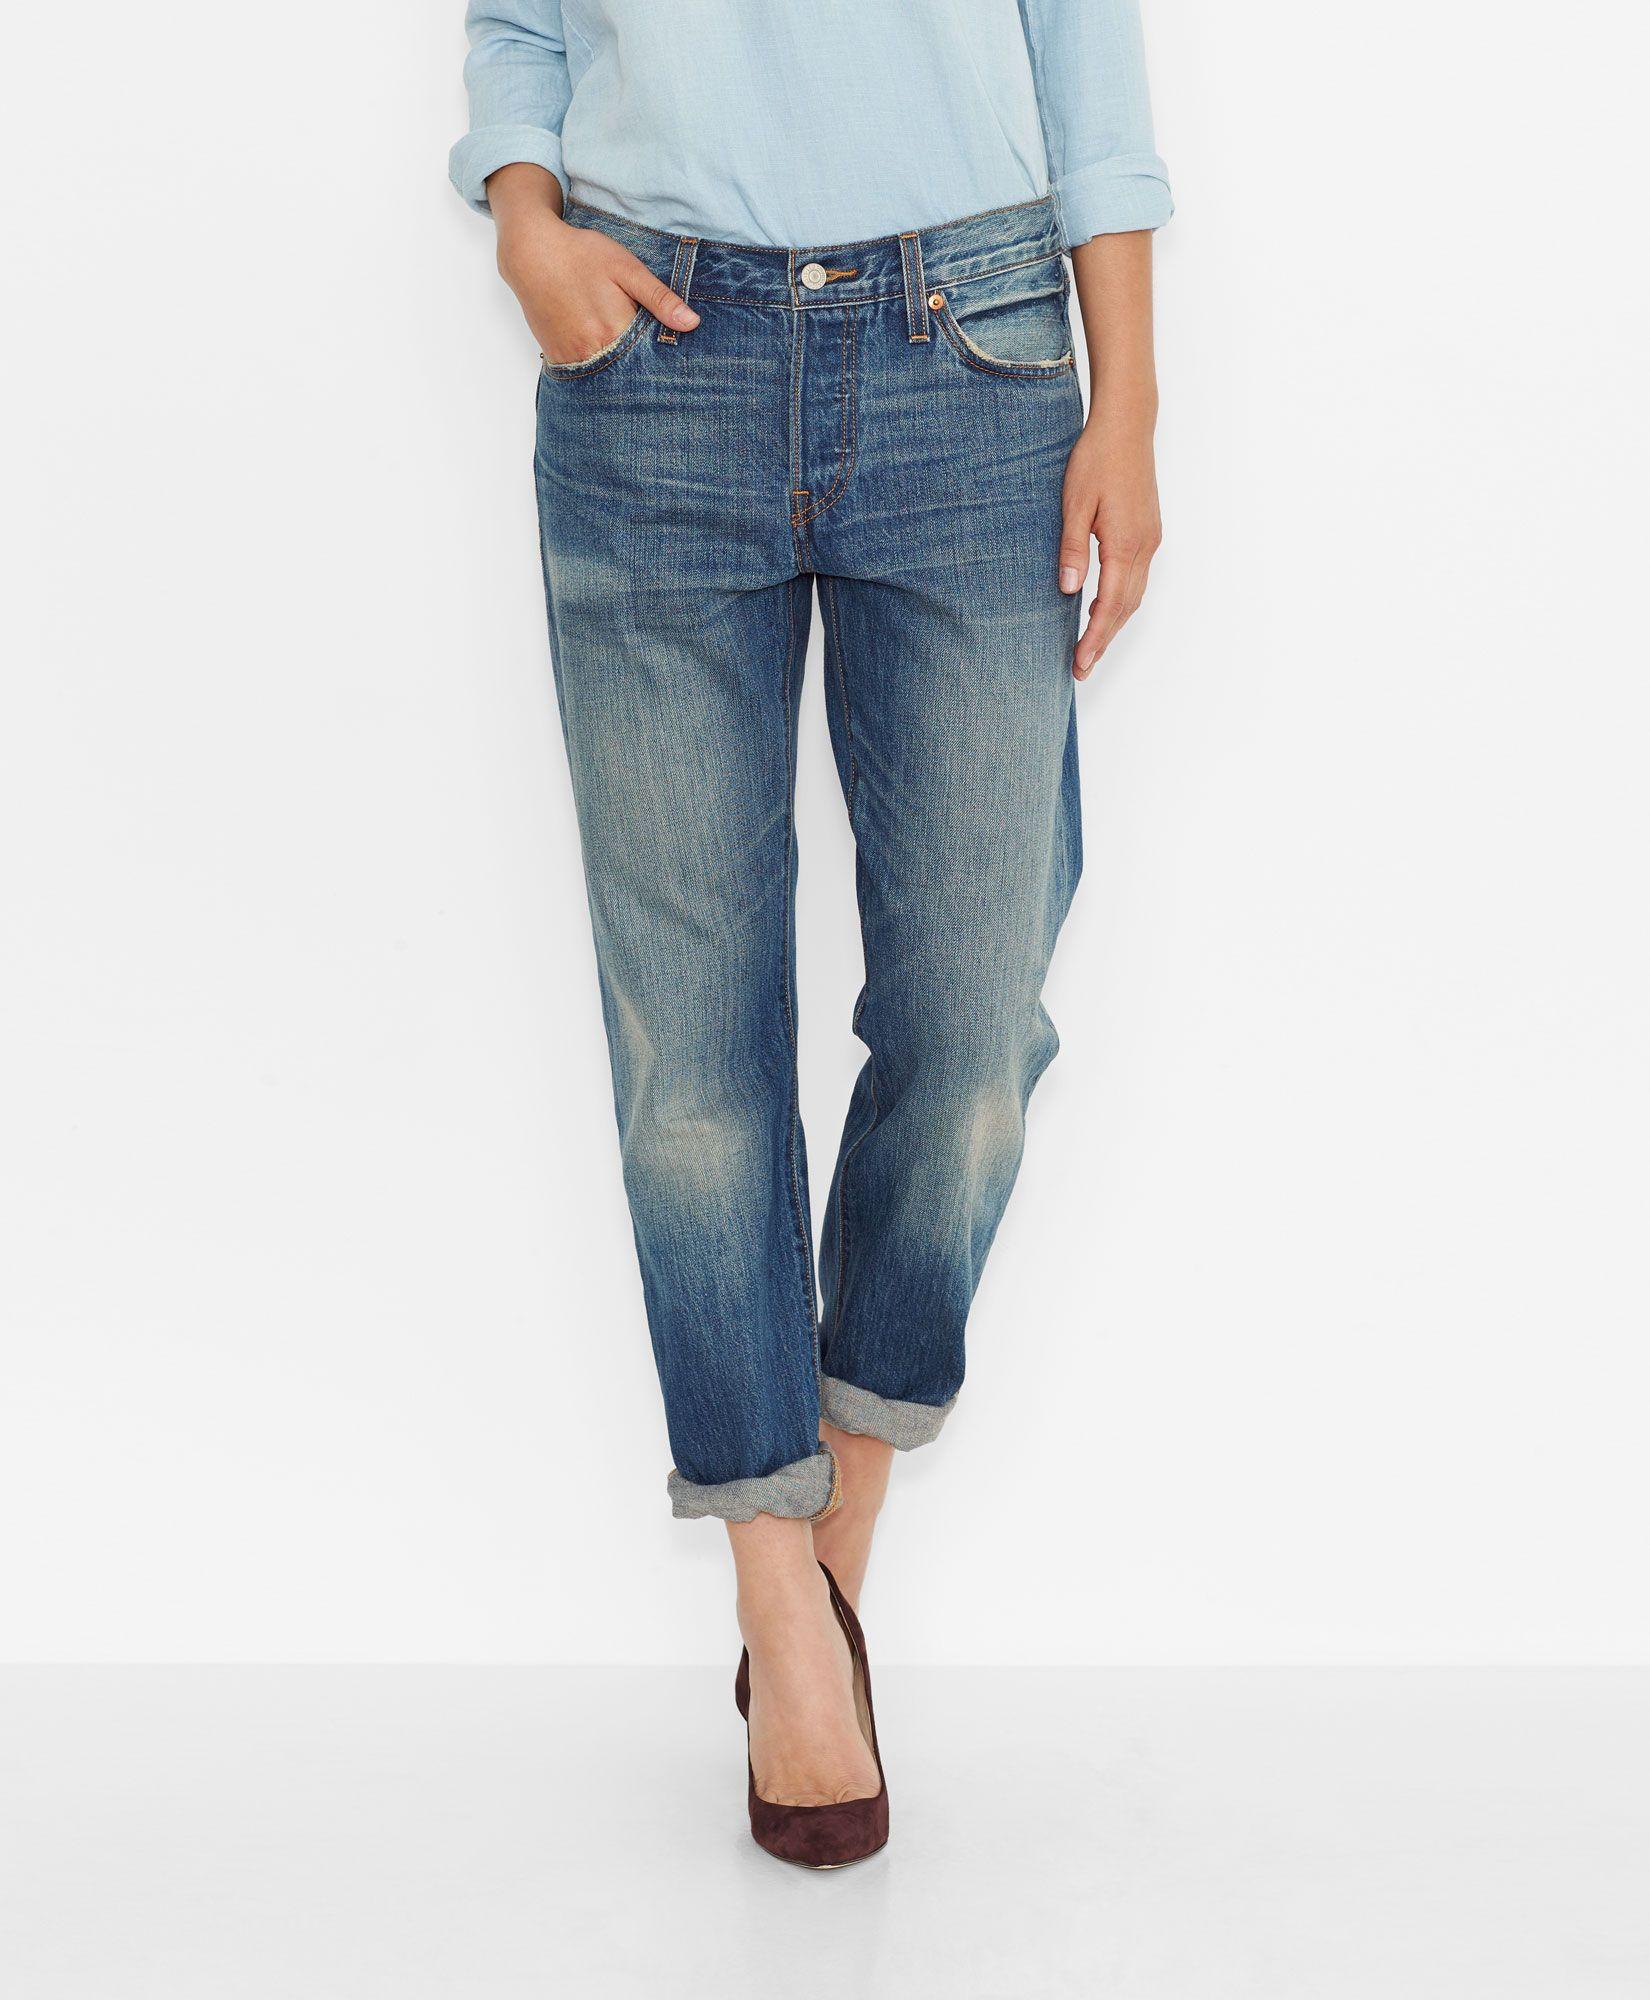 Levi's 501® Original Jeans for Women - Vintage Indigo - Boyfriend ...